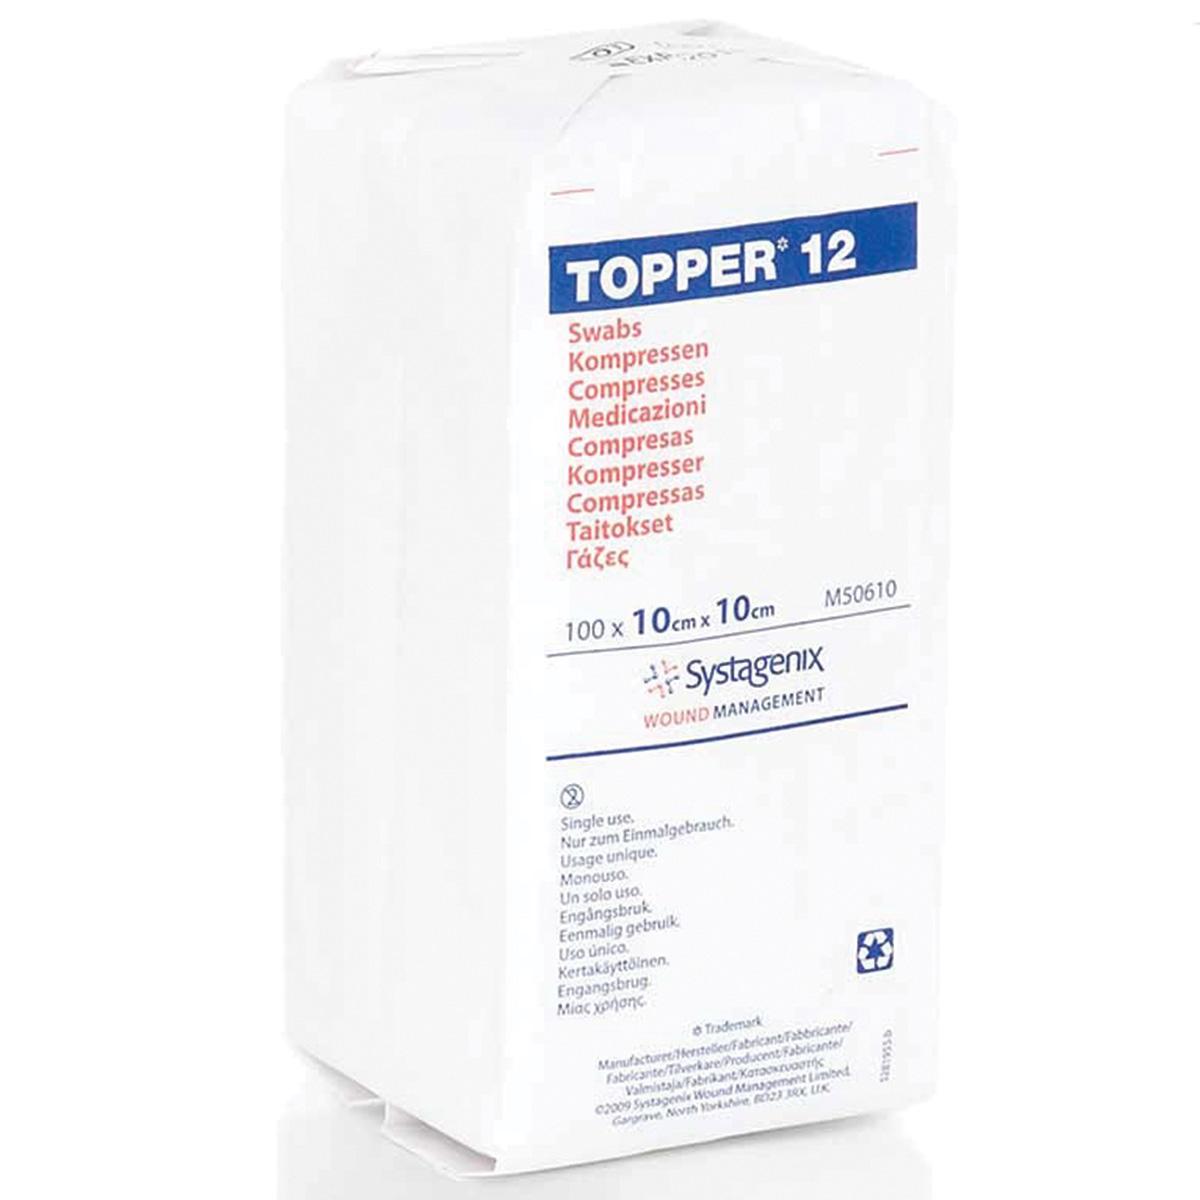 Topper 12 Swabs